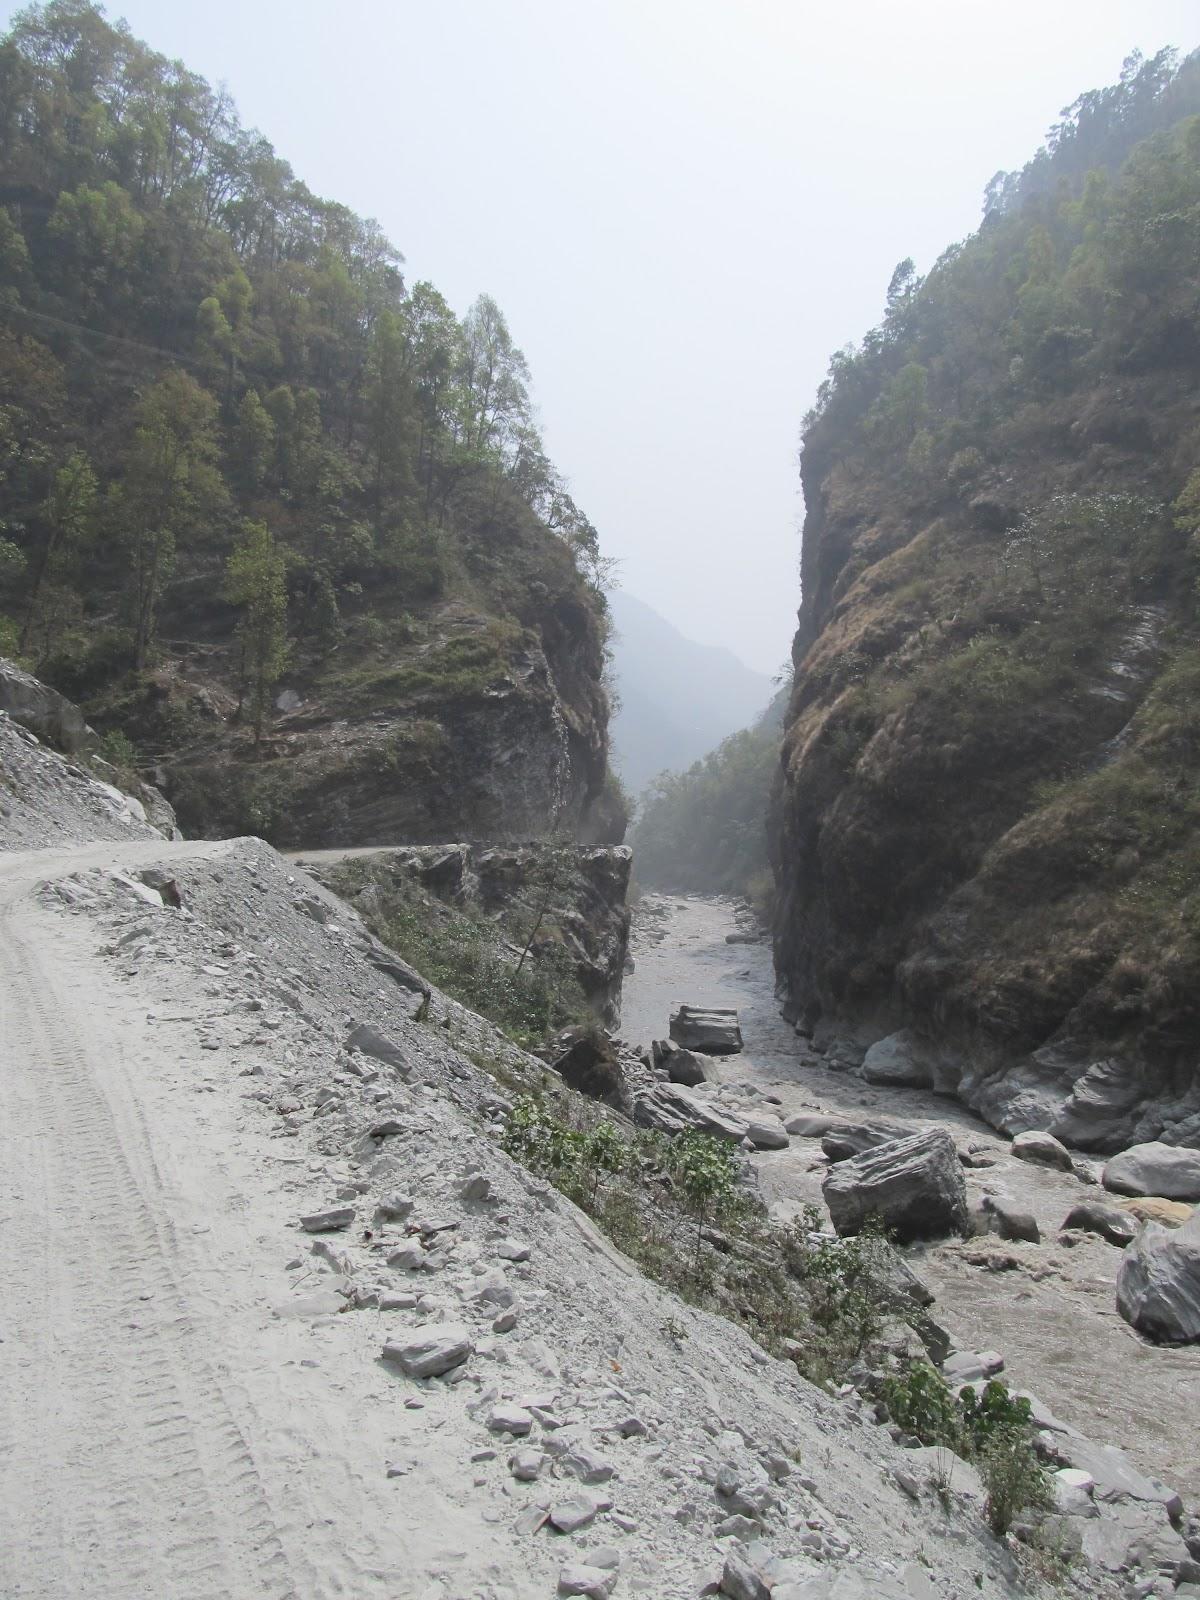 Kali_Gandaki_Valley02,_Nepal.JPG